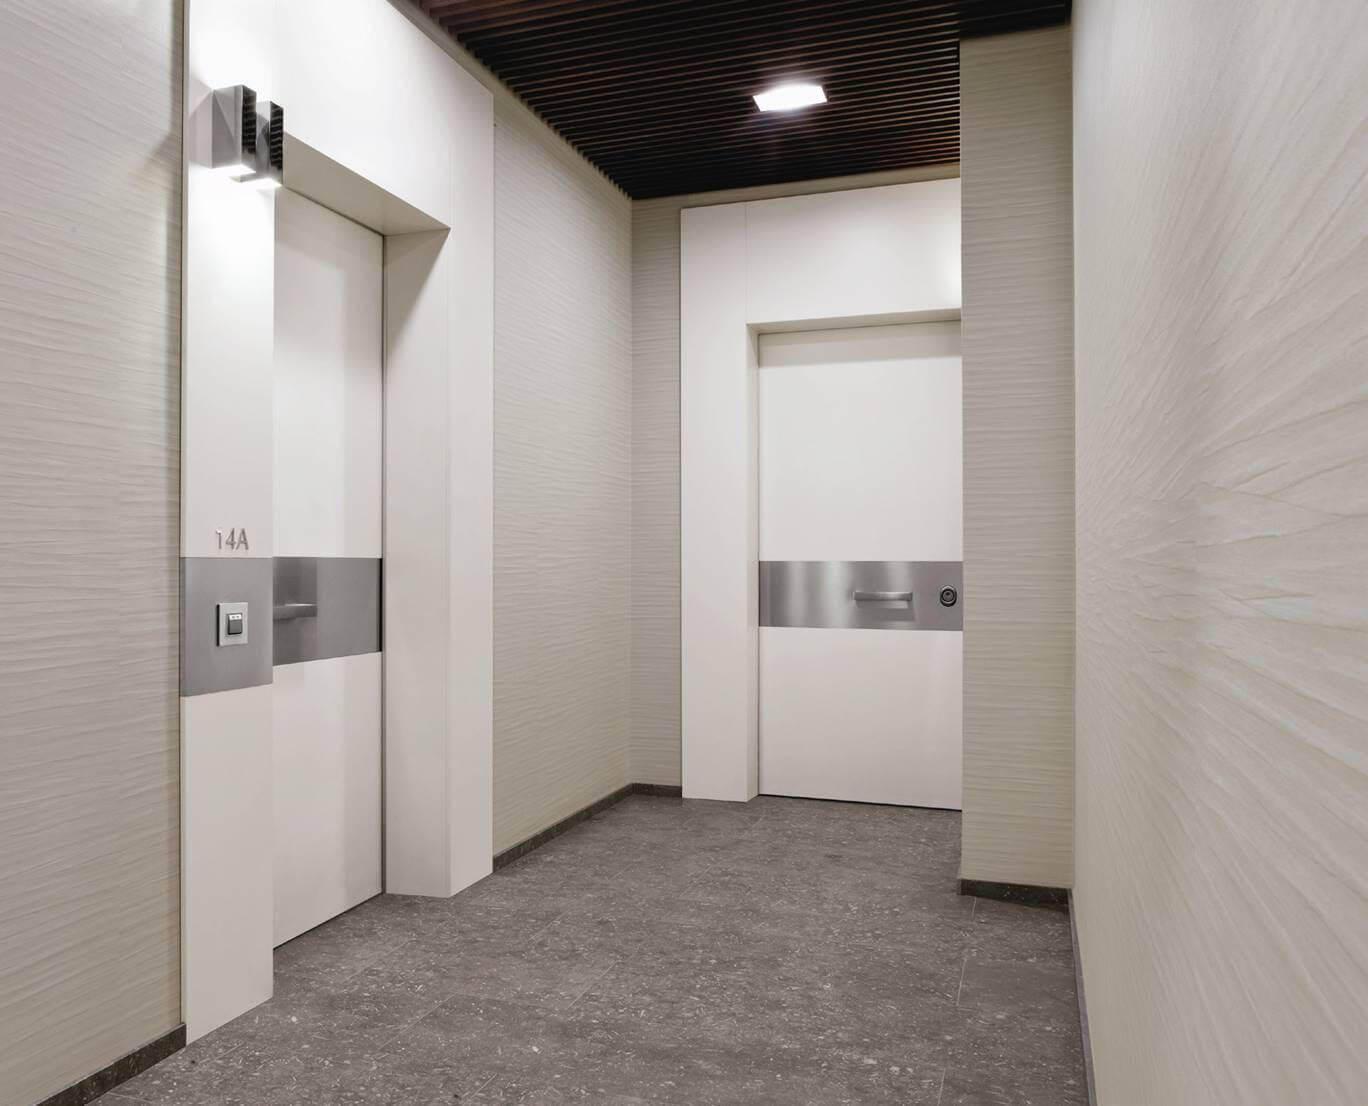 SVAI_porta blindata incassata muro bianca e acciaio